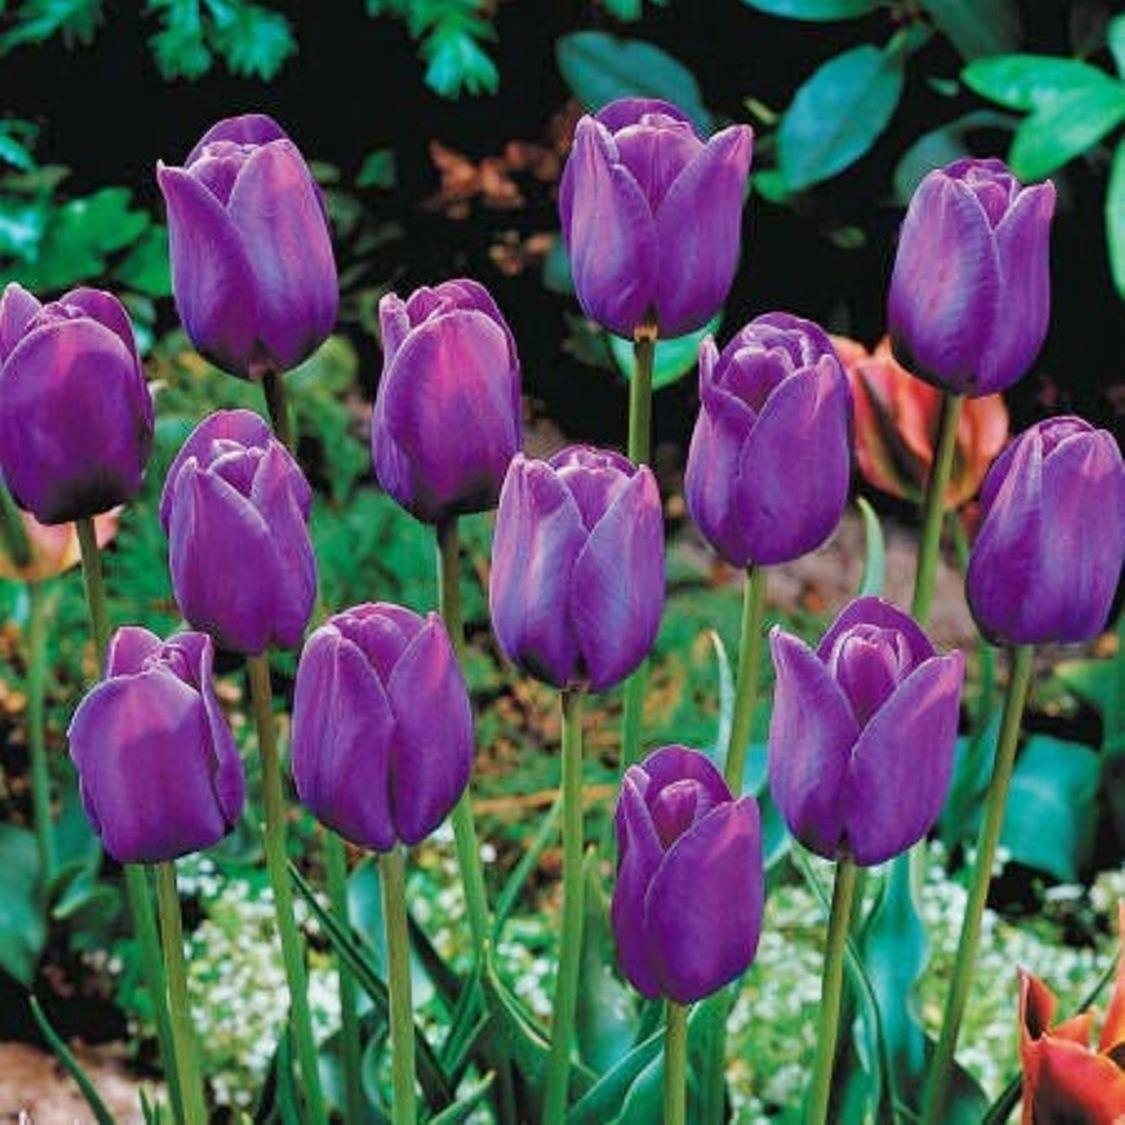 Cheap perennial flower bulbs find perennial flower bulbs deals on silksart 5 bulbs purple tulip bulbs early bloom perennial bulbs for garden planting beautiful flower izmirmasajfo